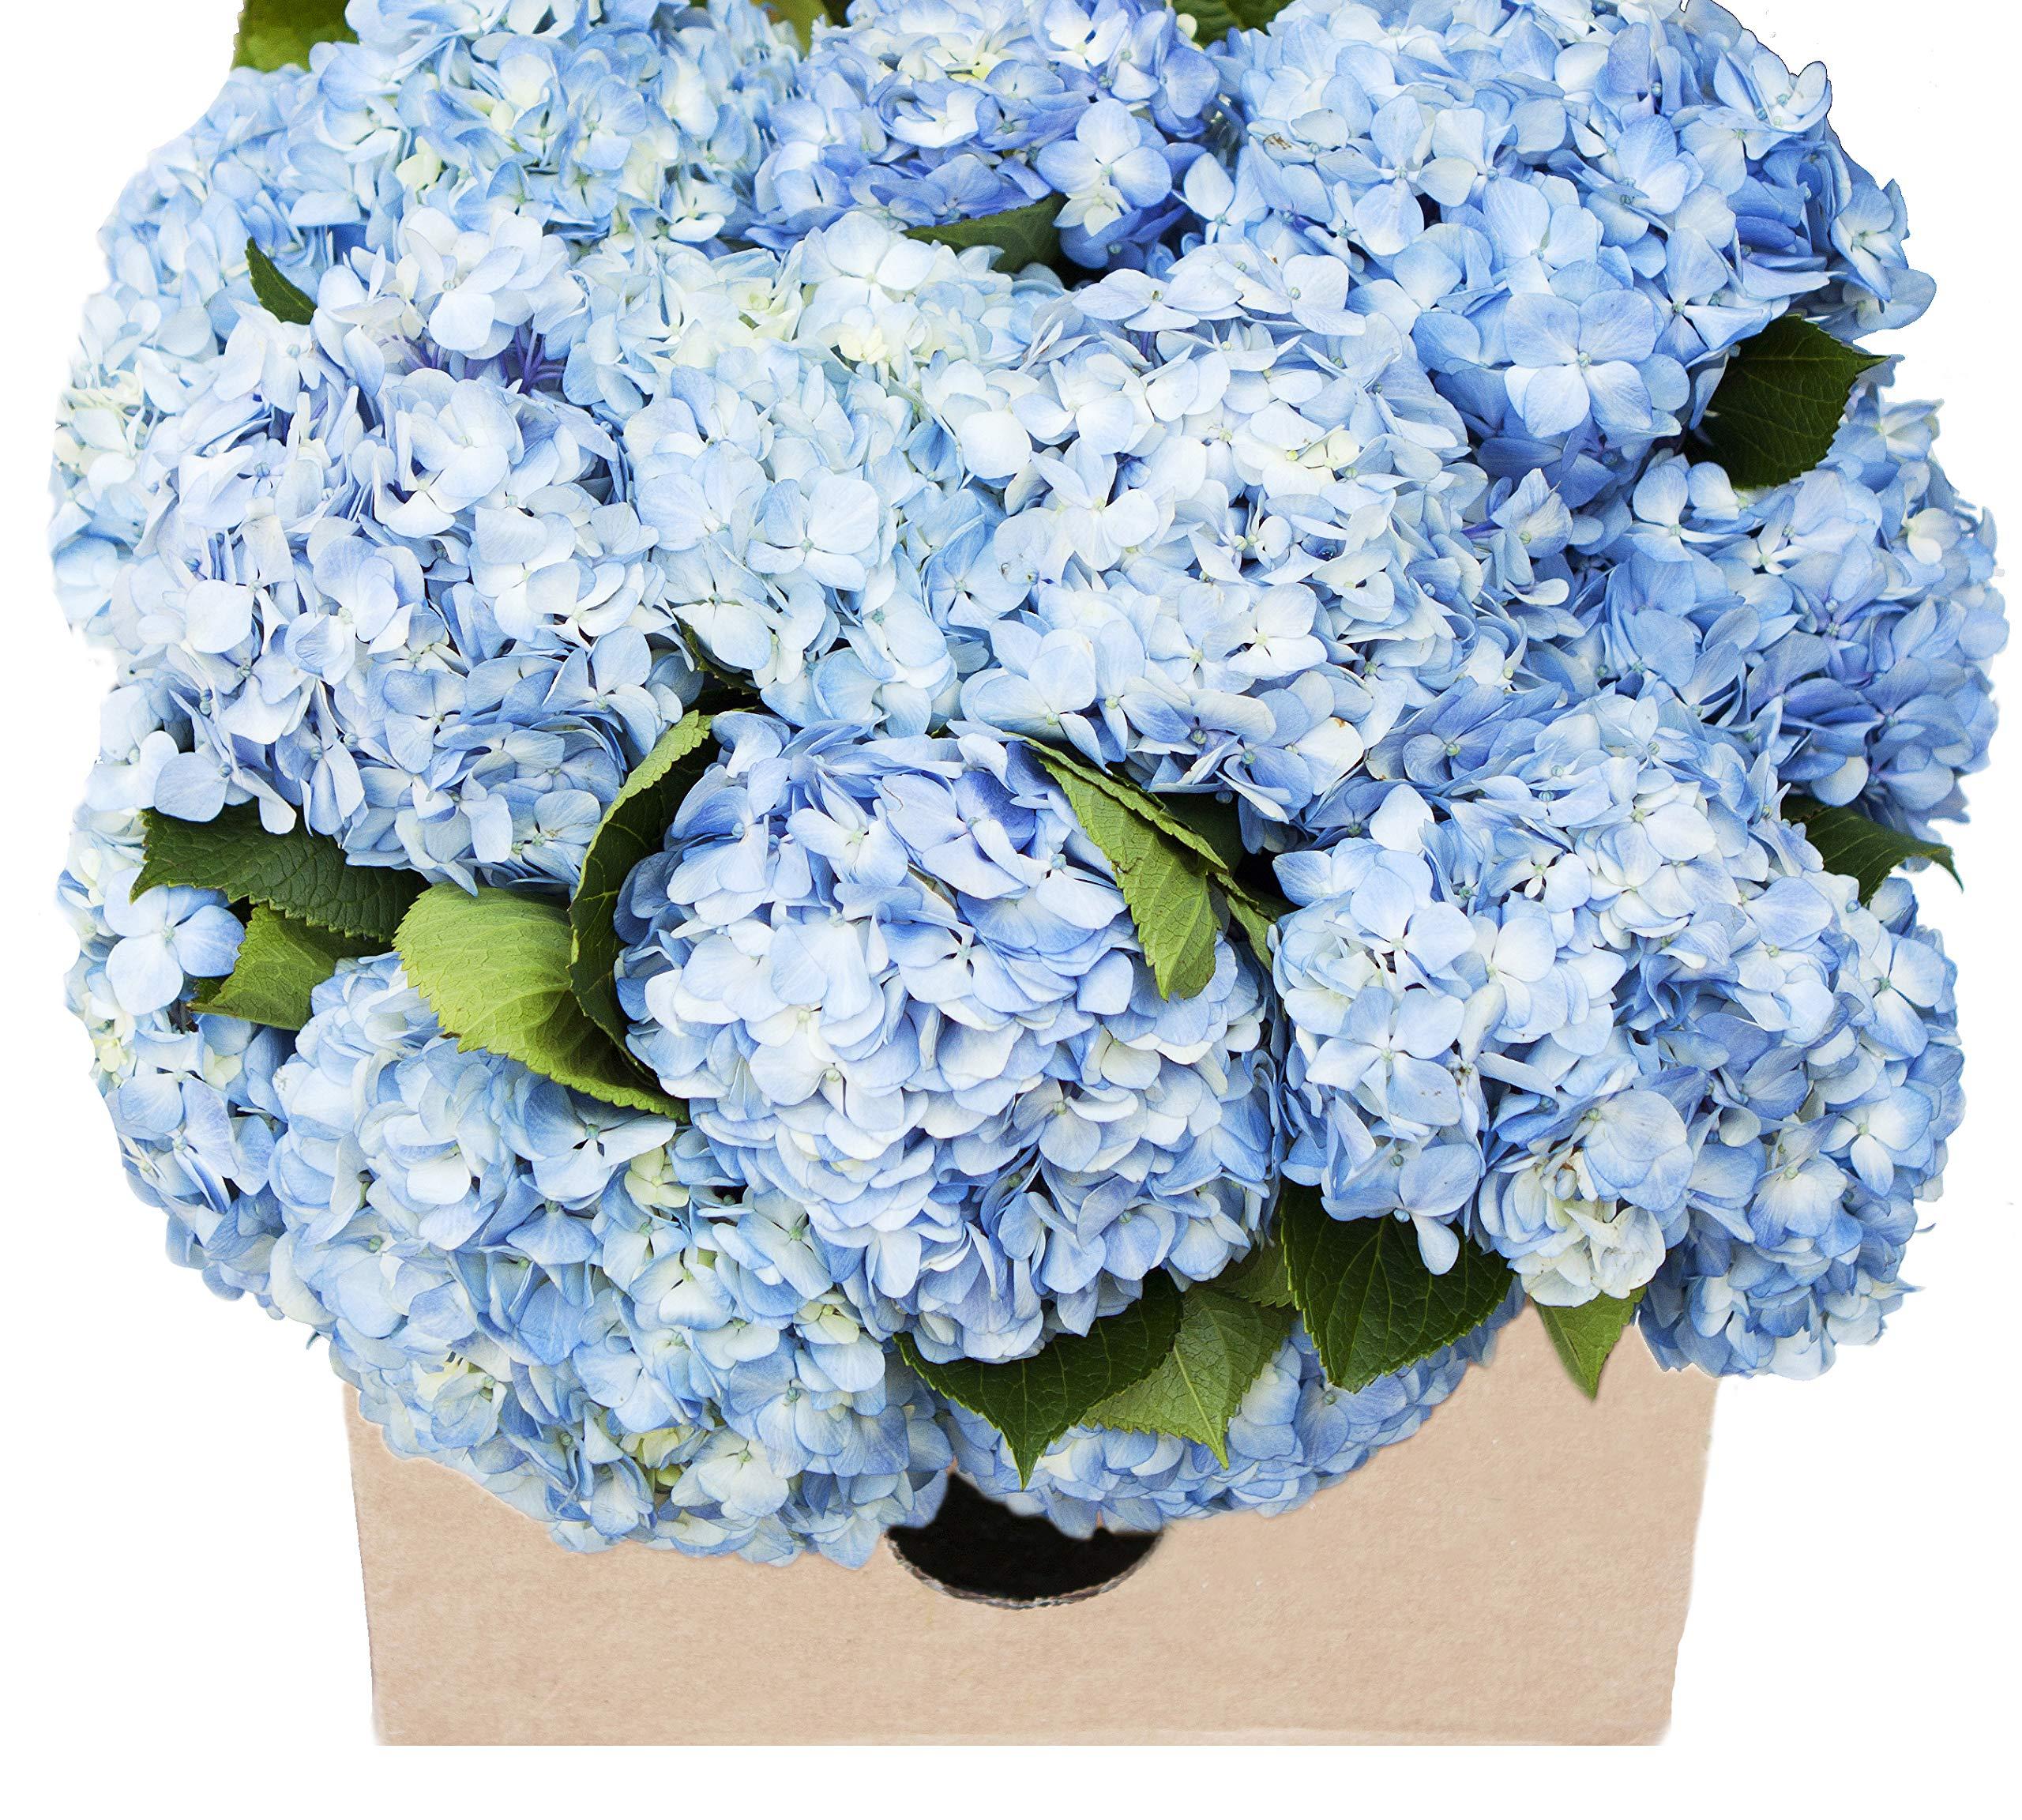 Blooms2Door 30 Blue Hydrangeas (Farm-Fresh, Naturally Colored, Premium Quality) by Blooms2Door (Image #1)